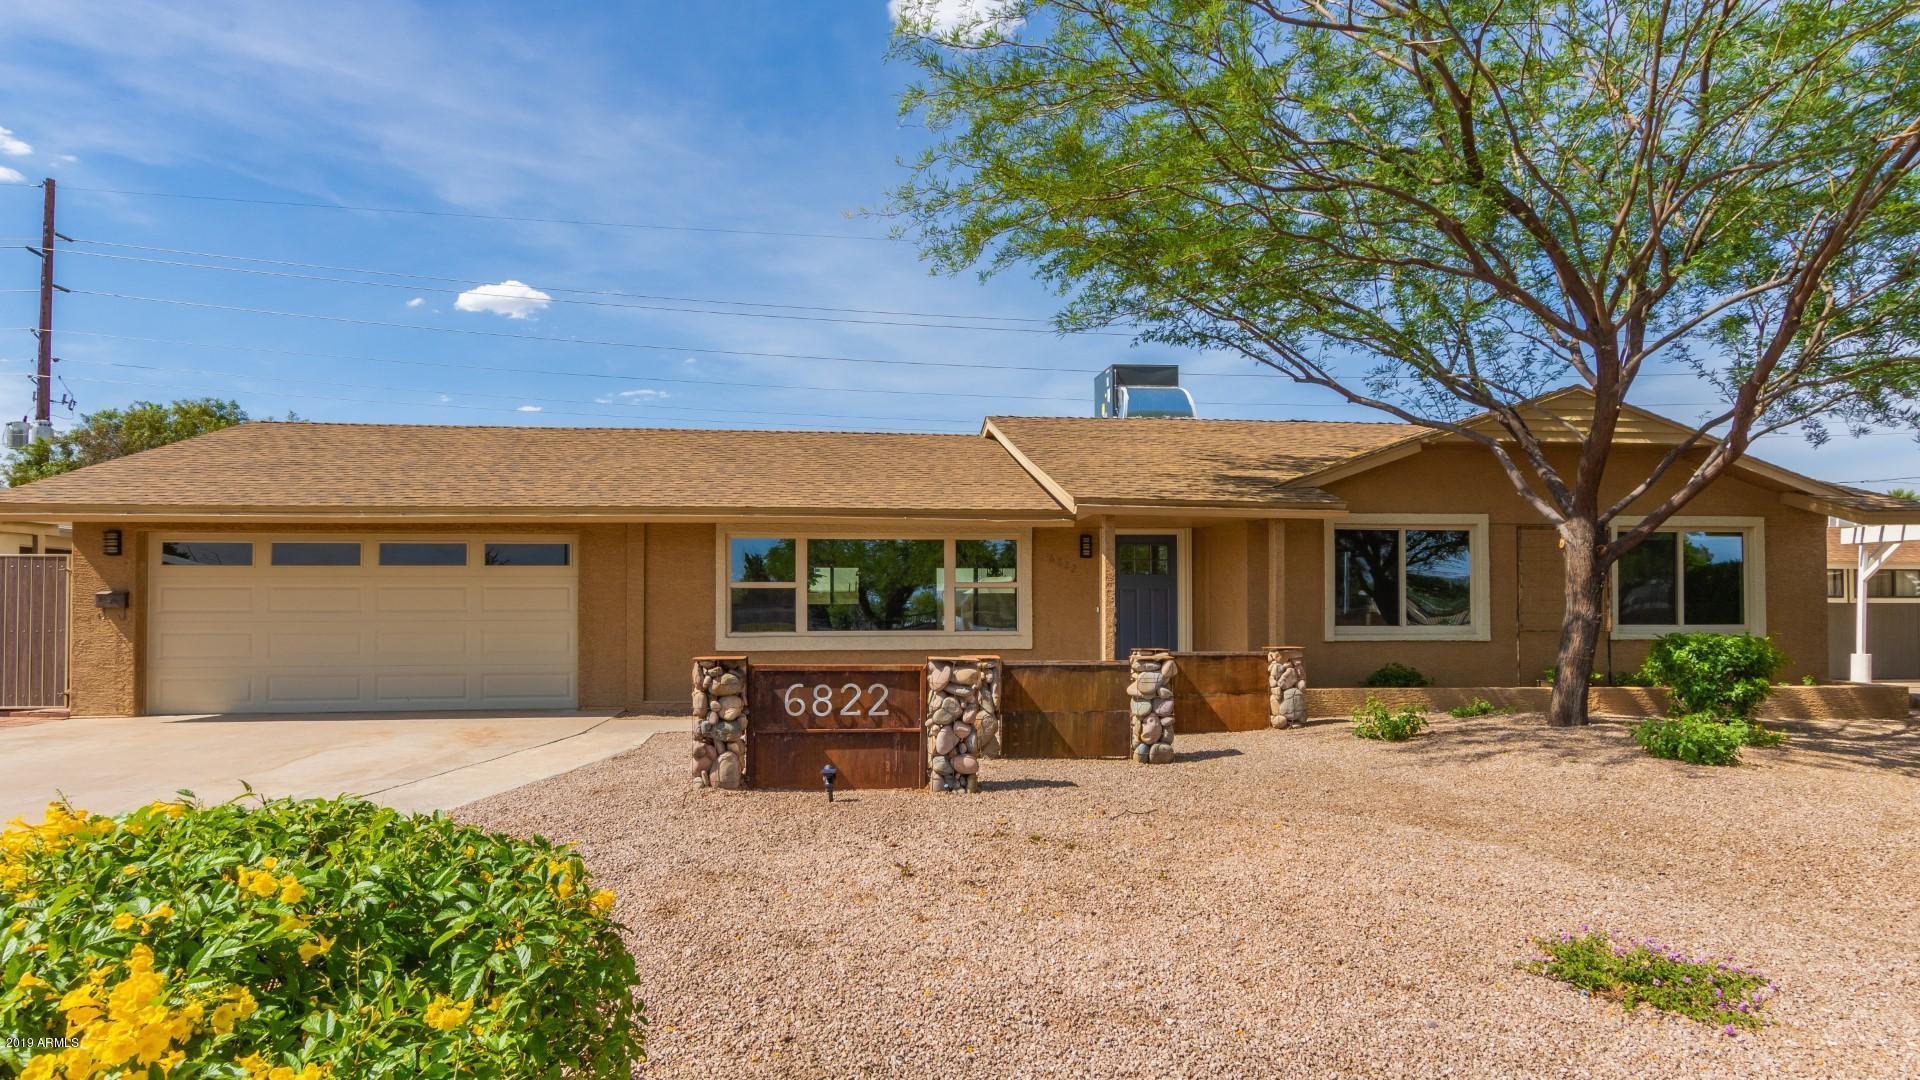 6822 E OAK Street, Scottsdale AZ 85257